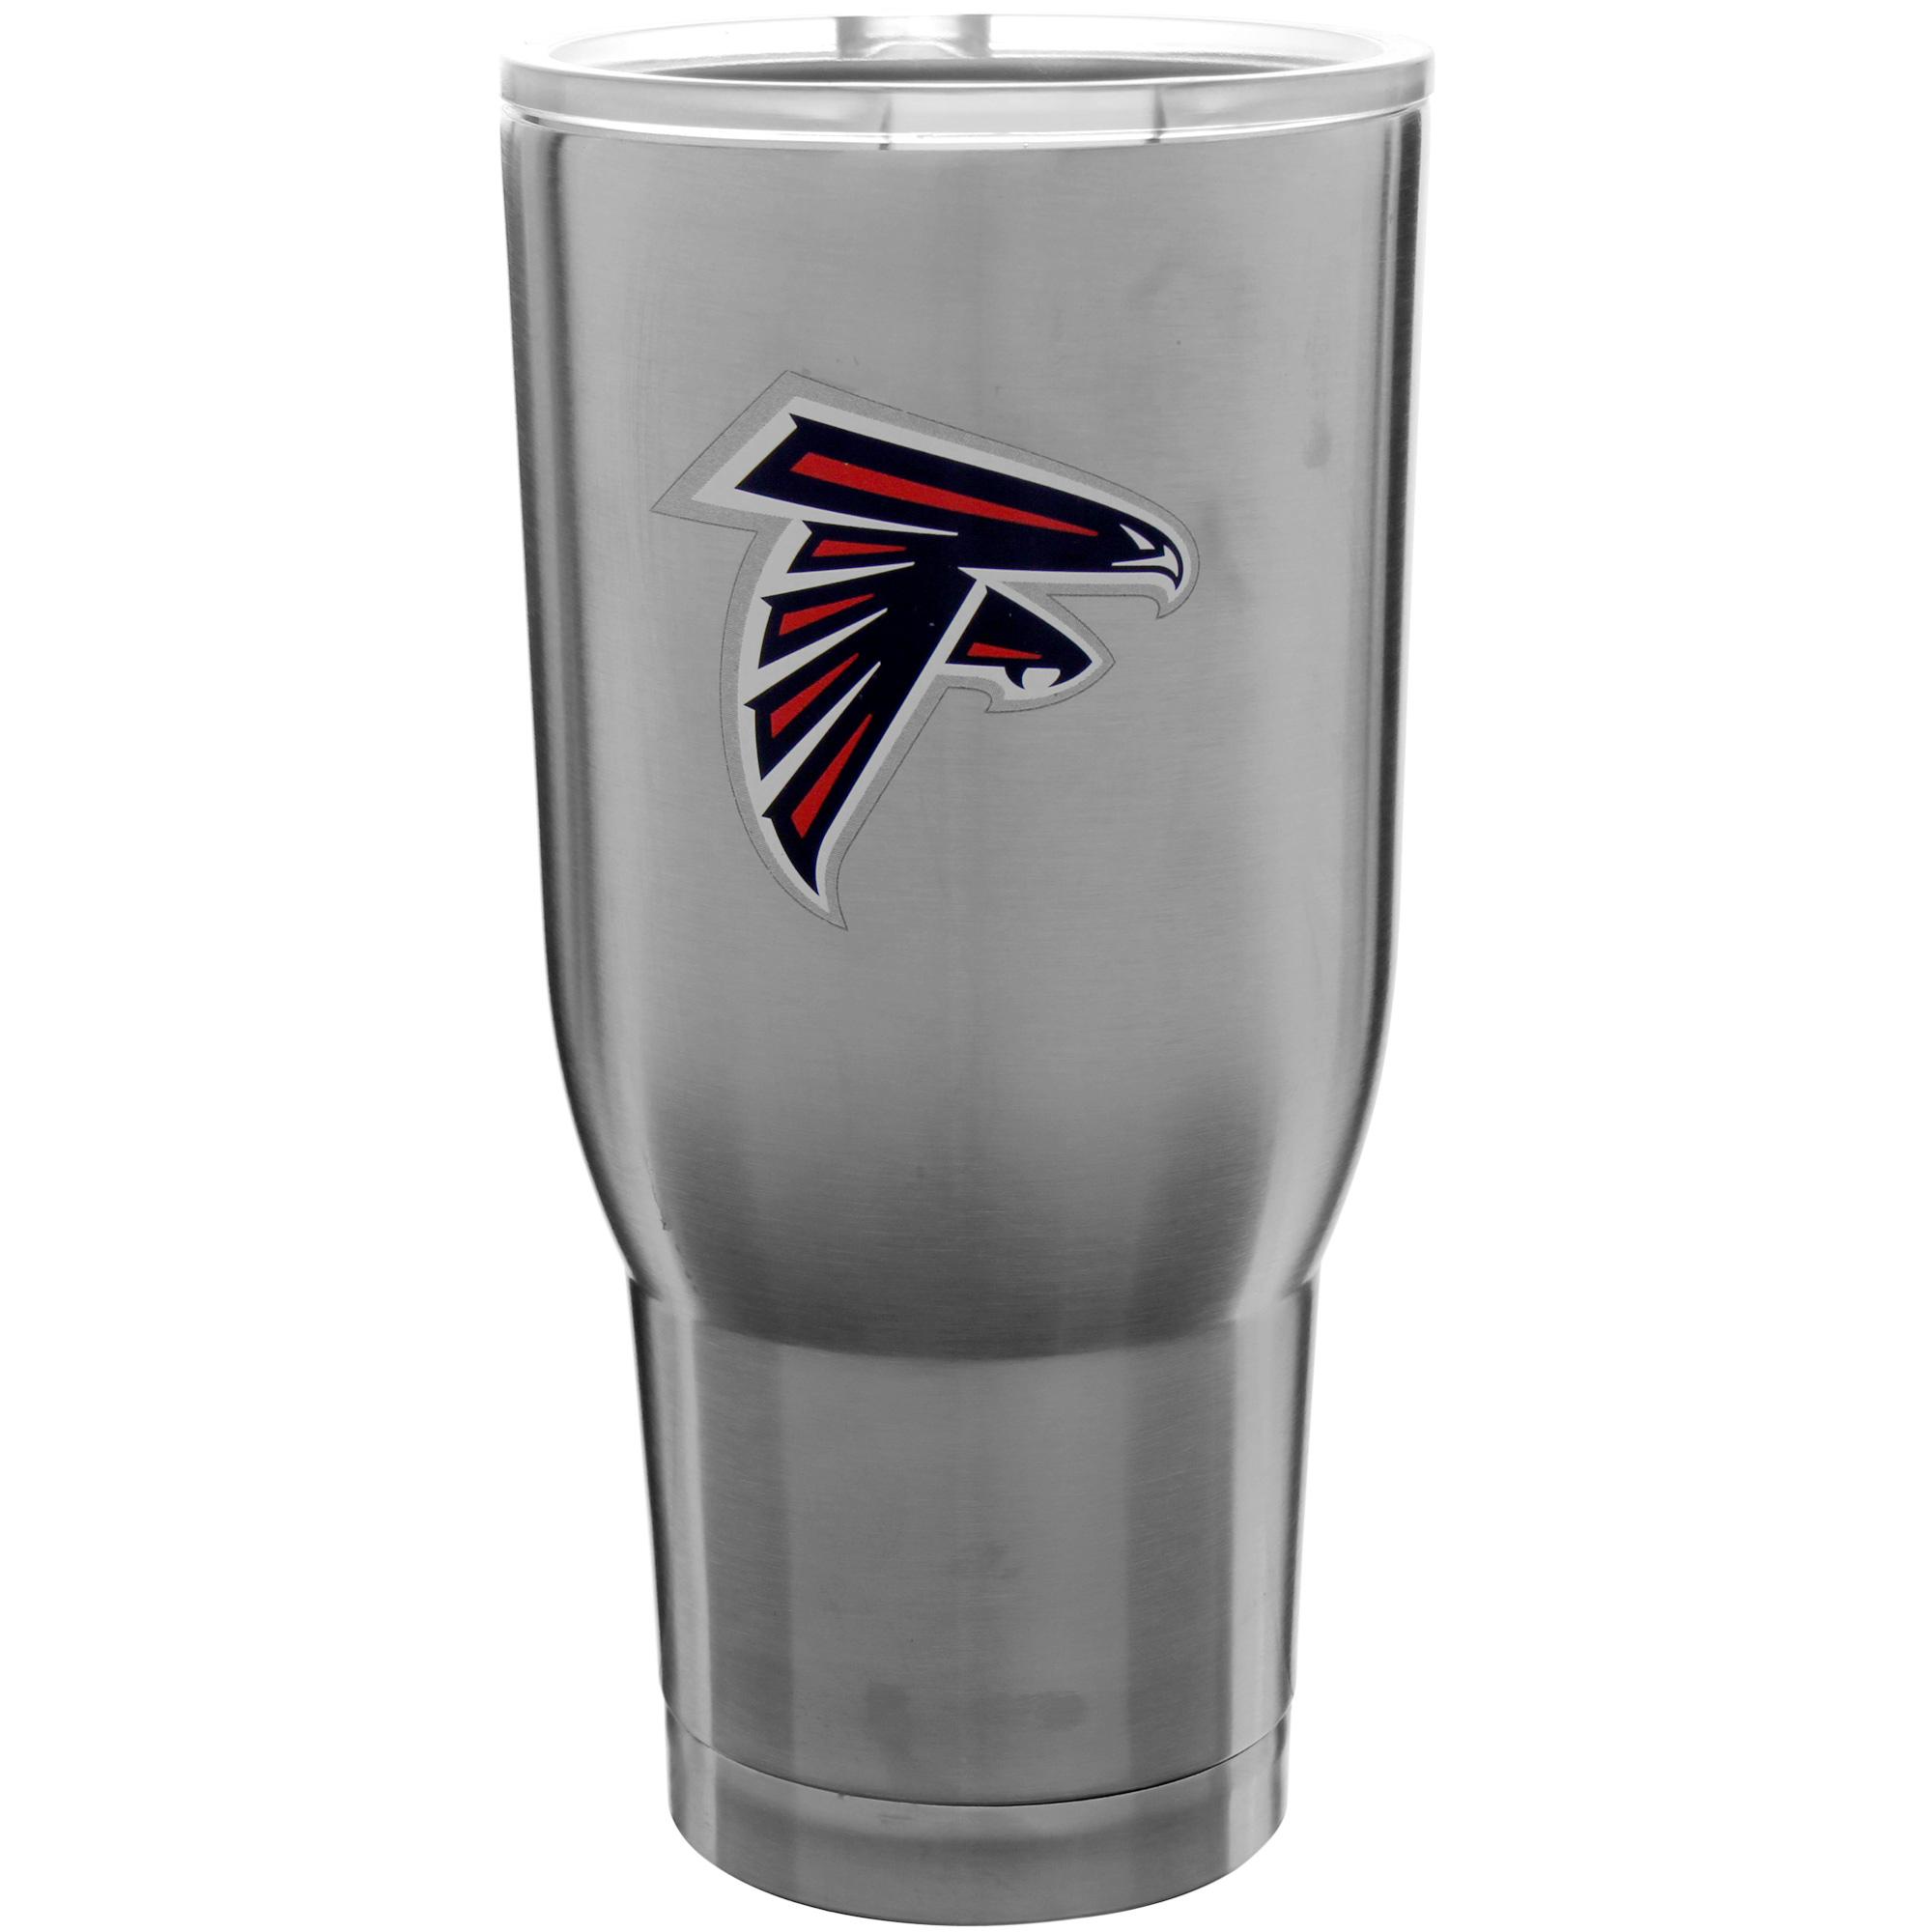 Atlanta Falcons 32oz. Stainless Steel Keeper Tumbler - No Size